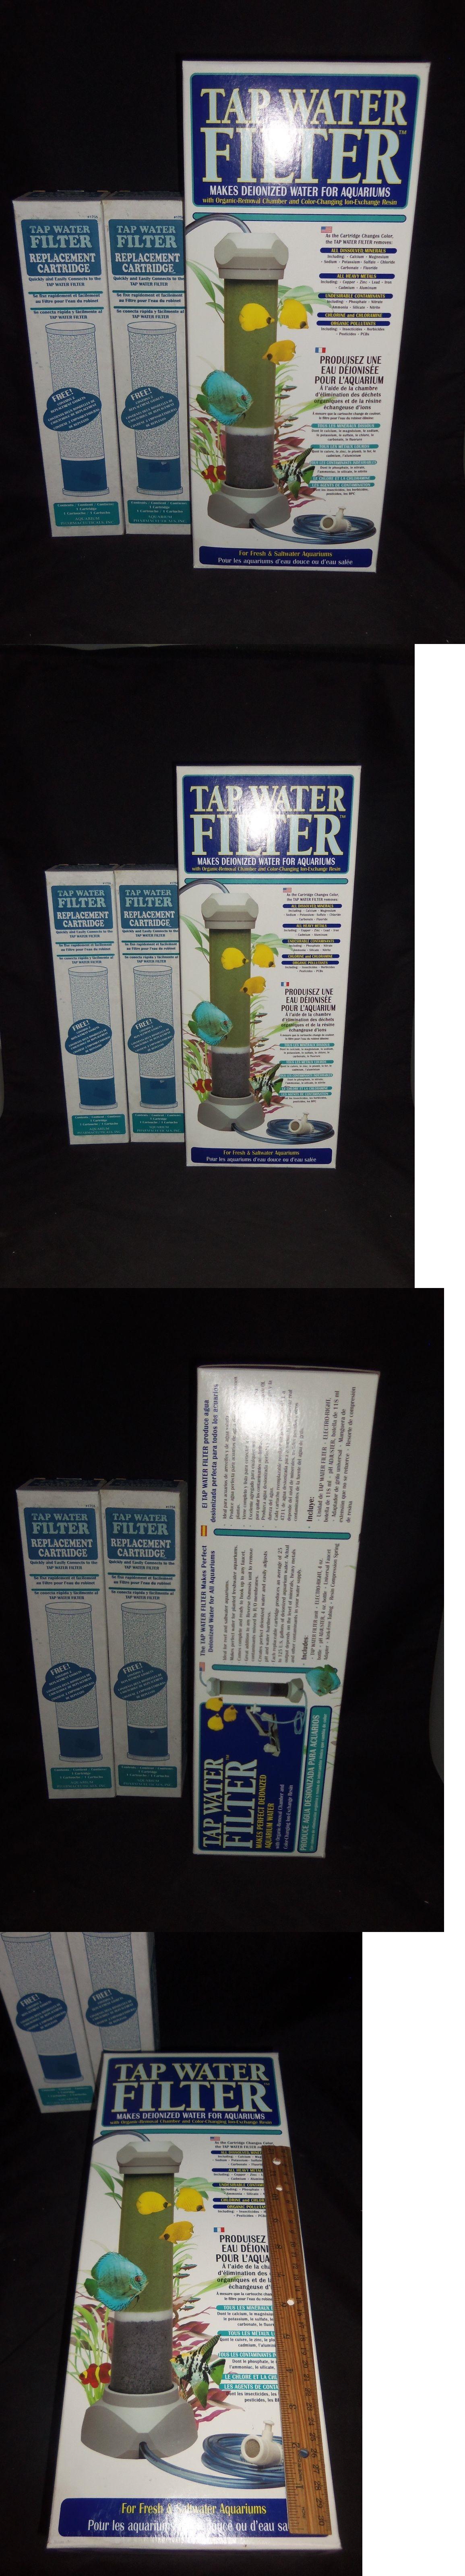 Fish tank supplies - Aquarium Supplies